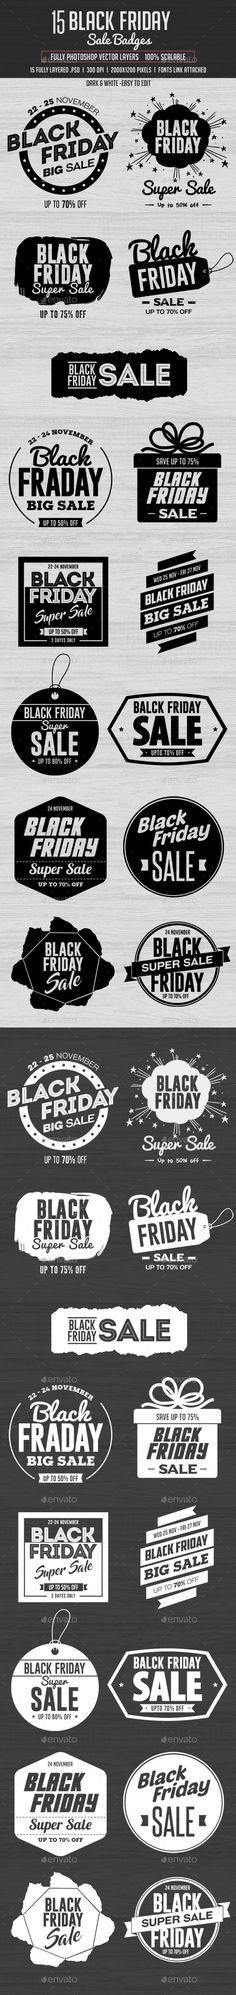 15 Black Friday Sale Badges  — PSD Template #advertising #season • Download ➝ https://graphicriver.net/item/15-black-friday-sale-badges/18376401?ref=pxcr